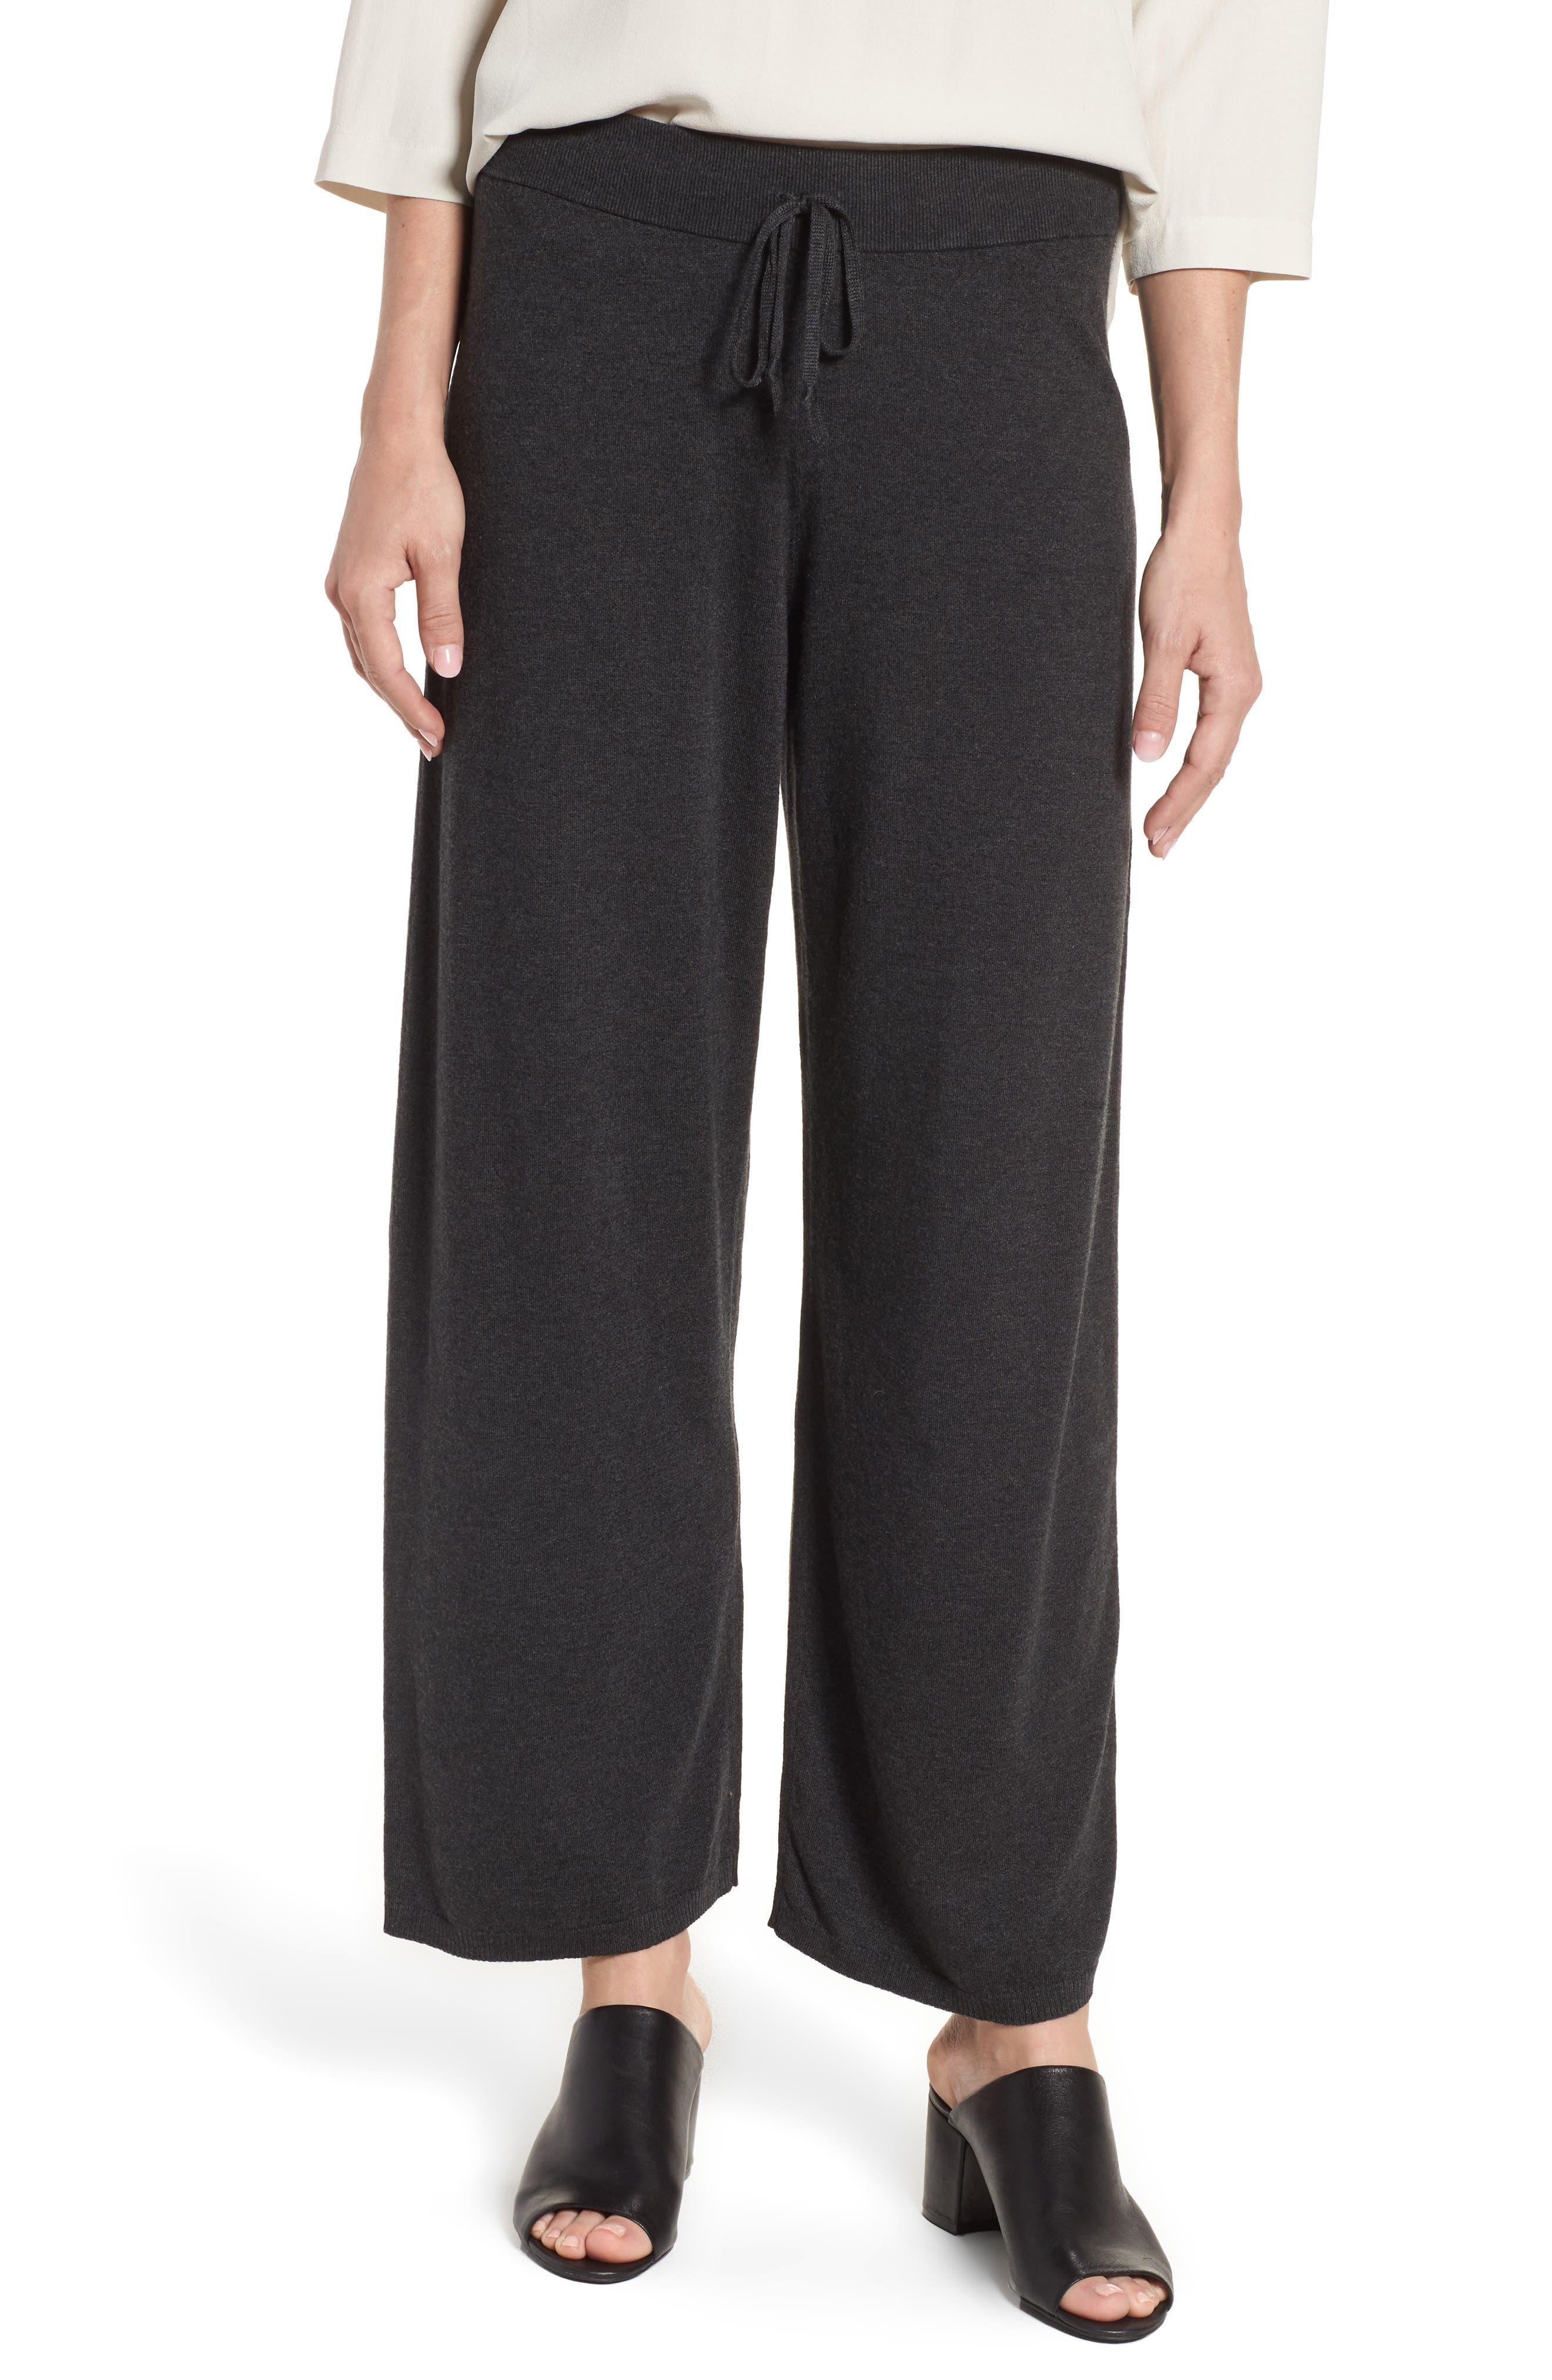 Tencel<sup>®</sup> Lyocell Blend Knit Wide Leg Pants,                         Main,                         color,